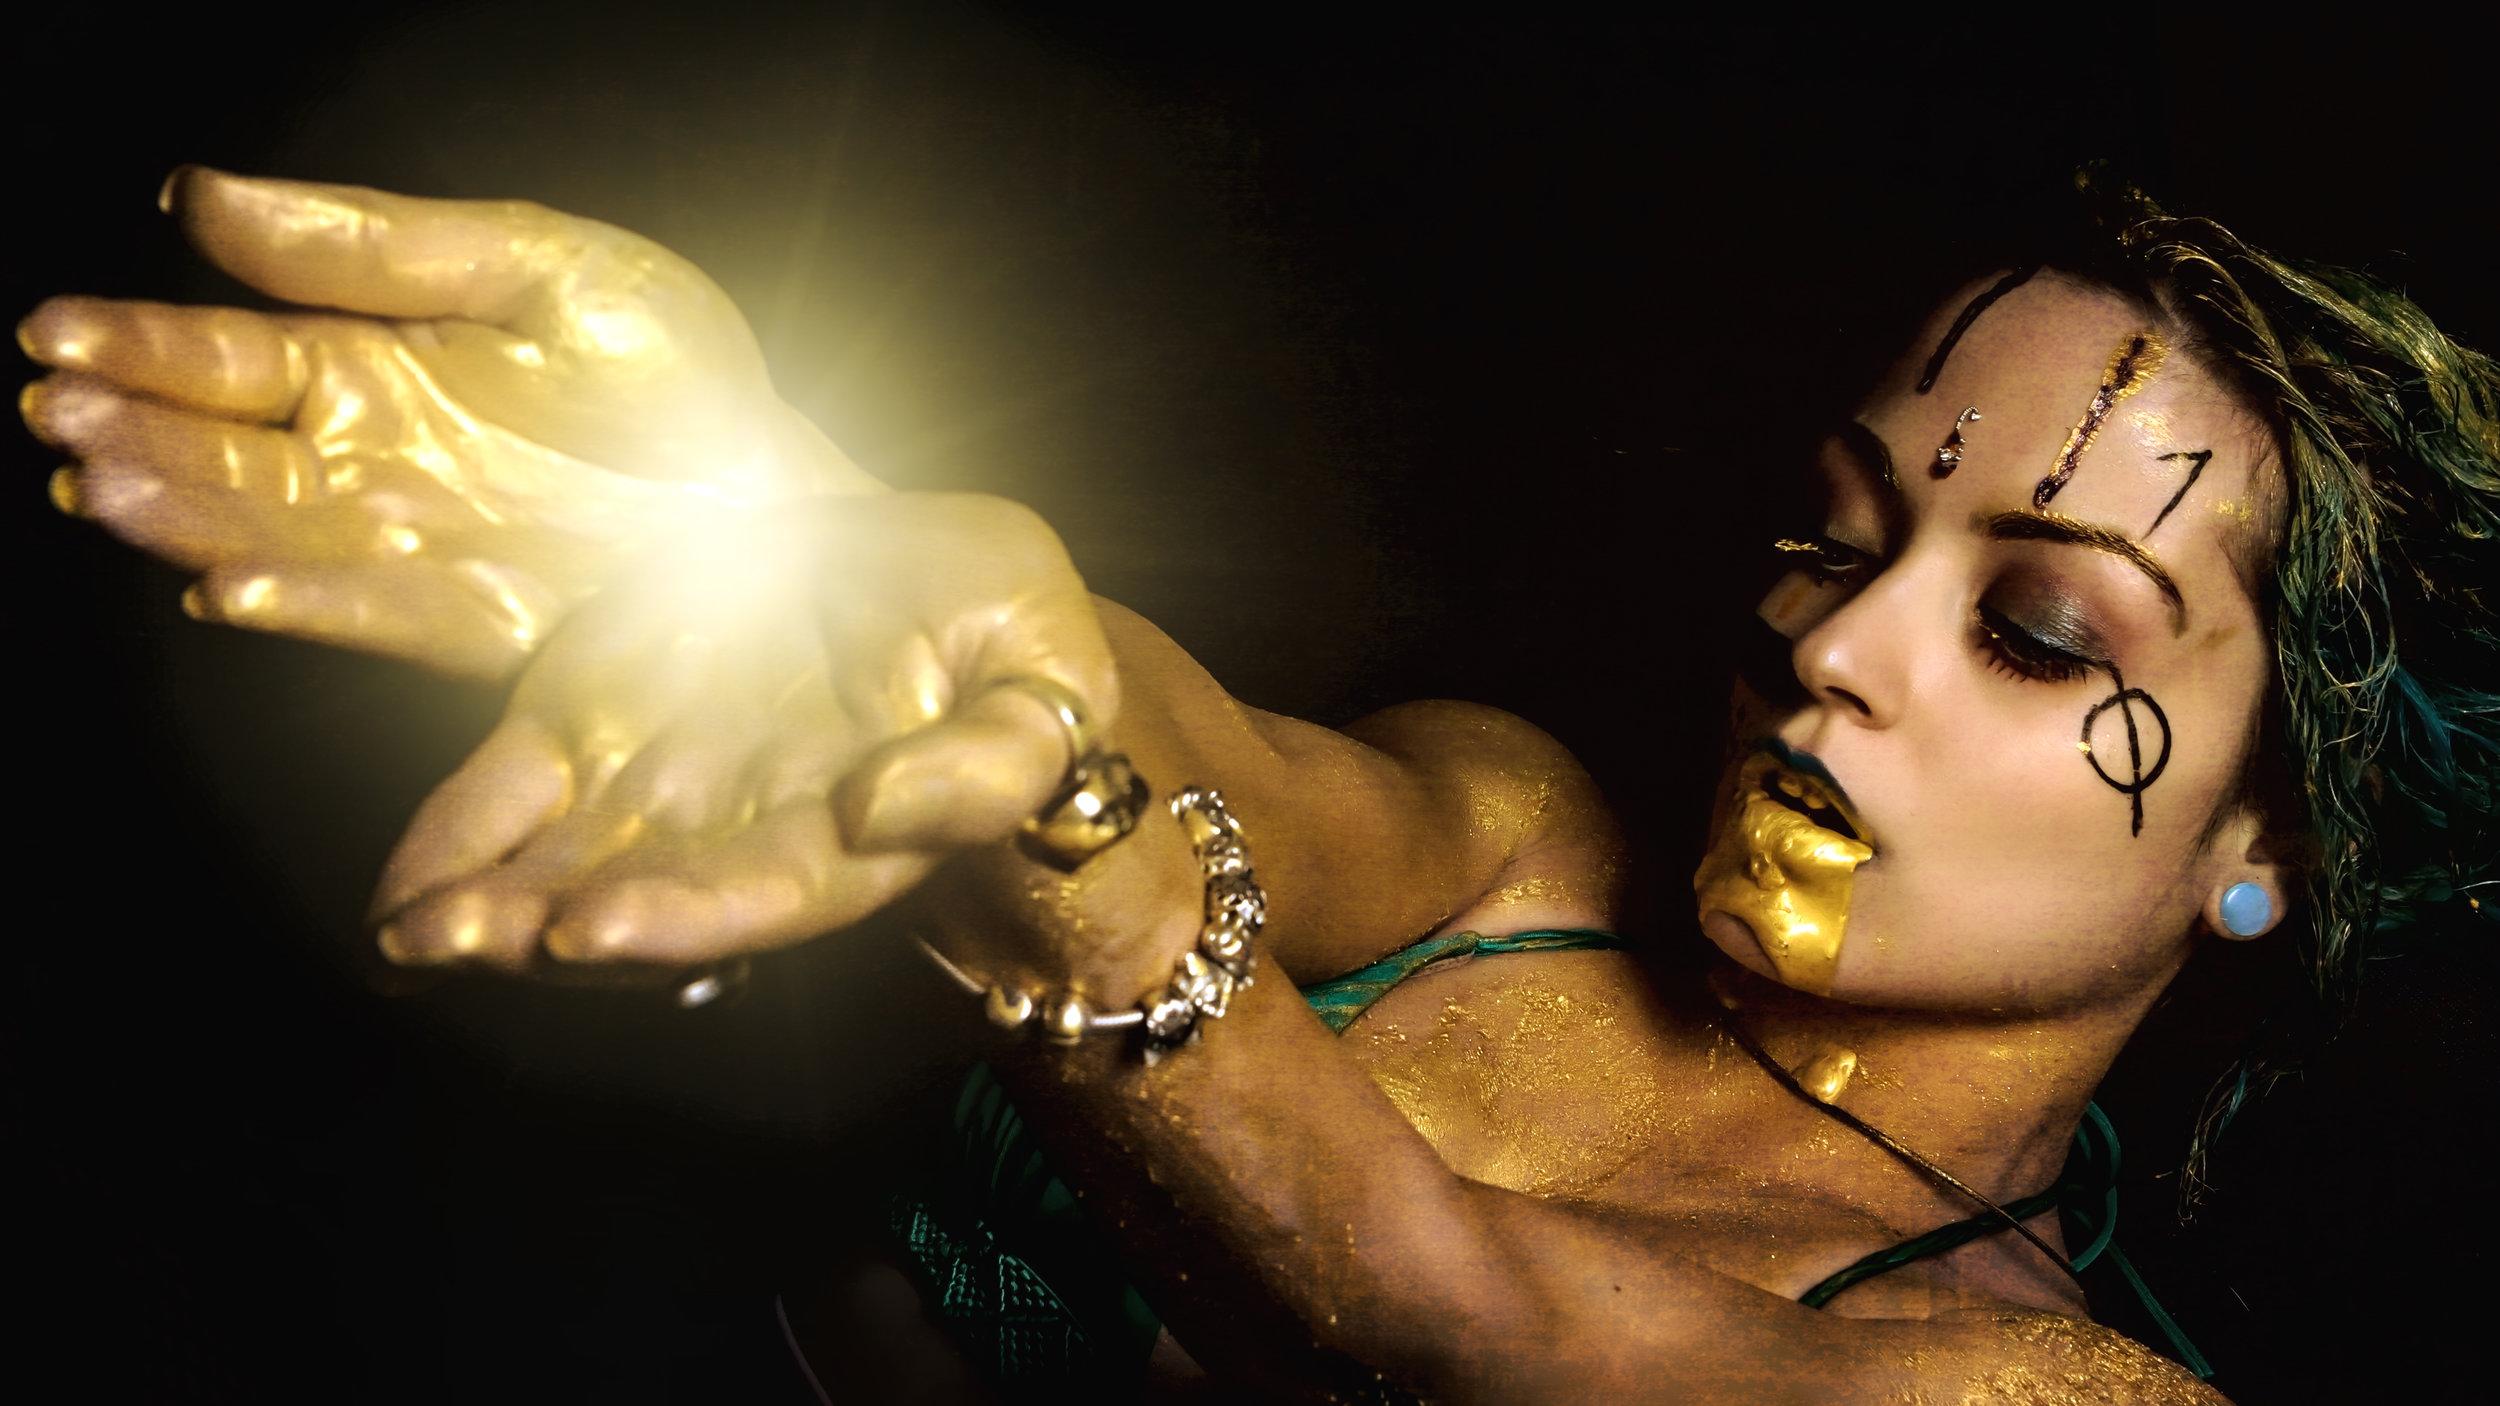 Golden Offering